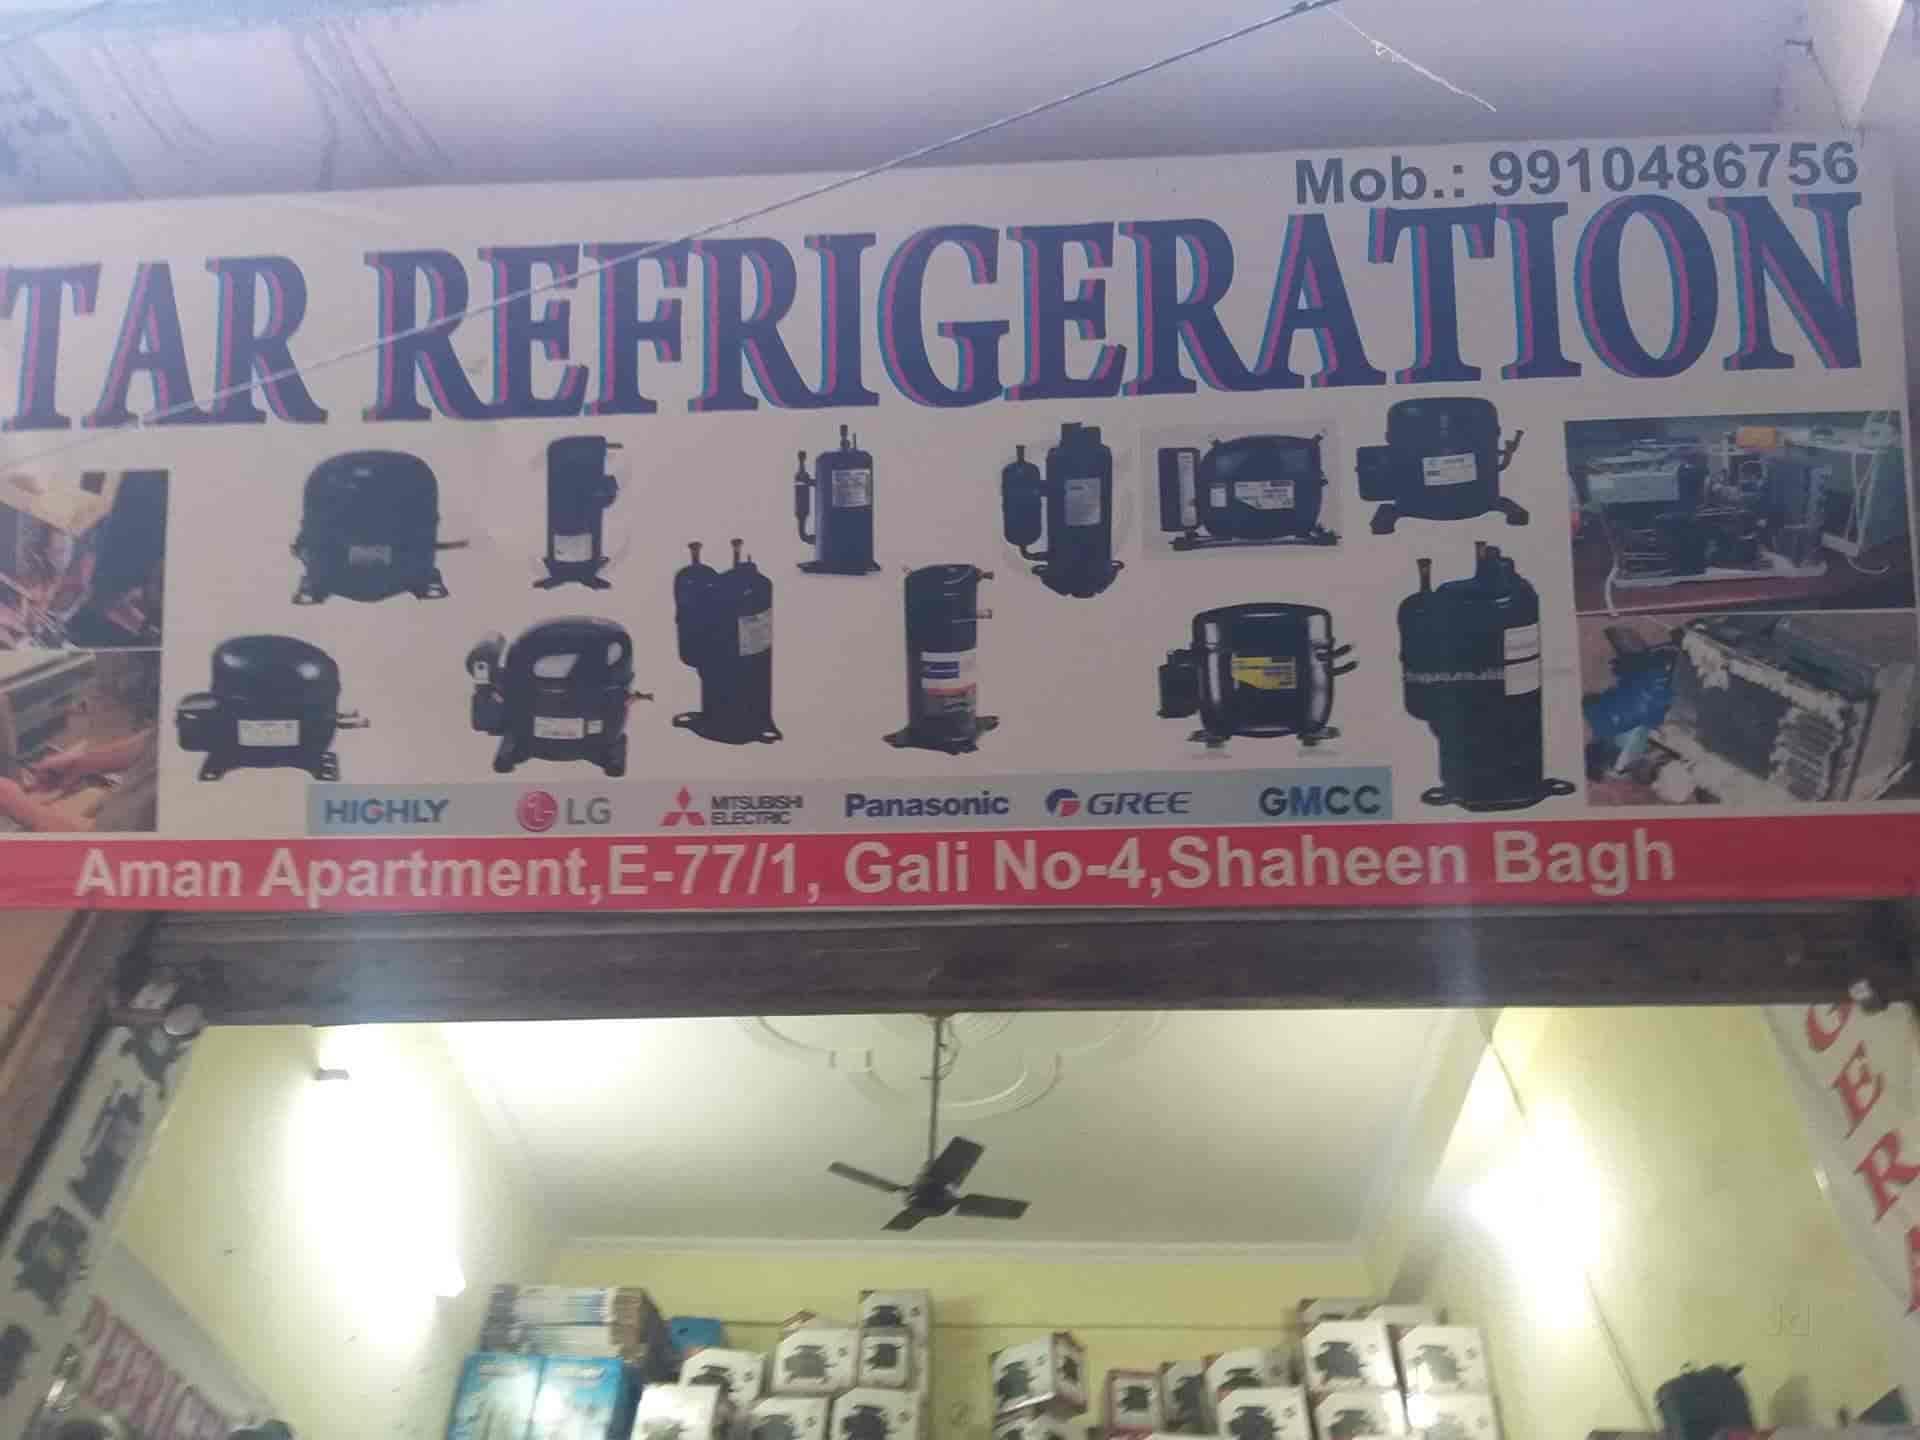 Star Refrigeration, Shaheen Bagh-Jamia Nagar - Compressor Dealers in